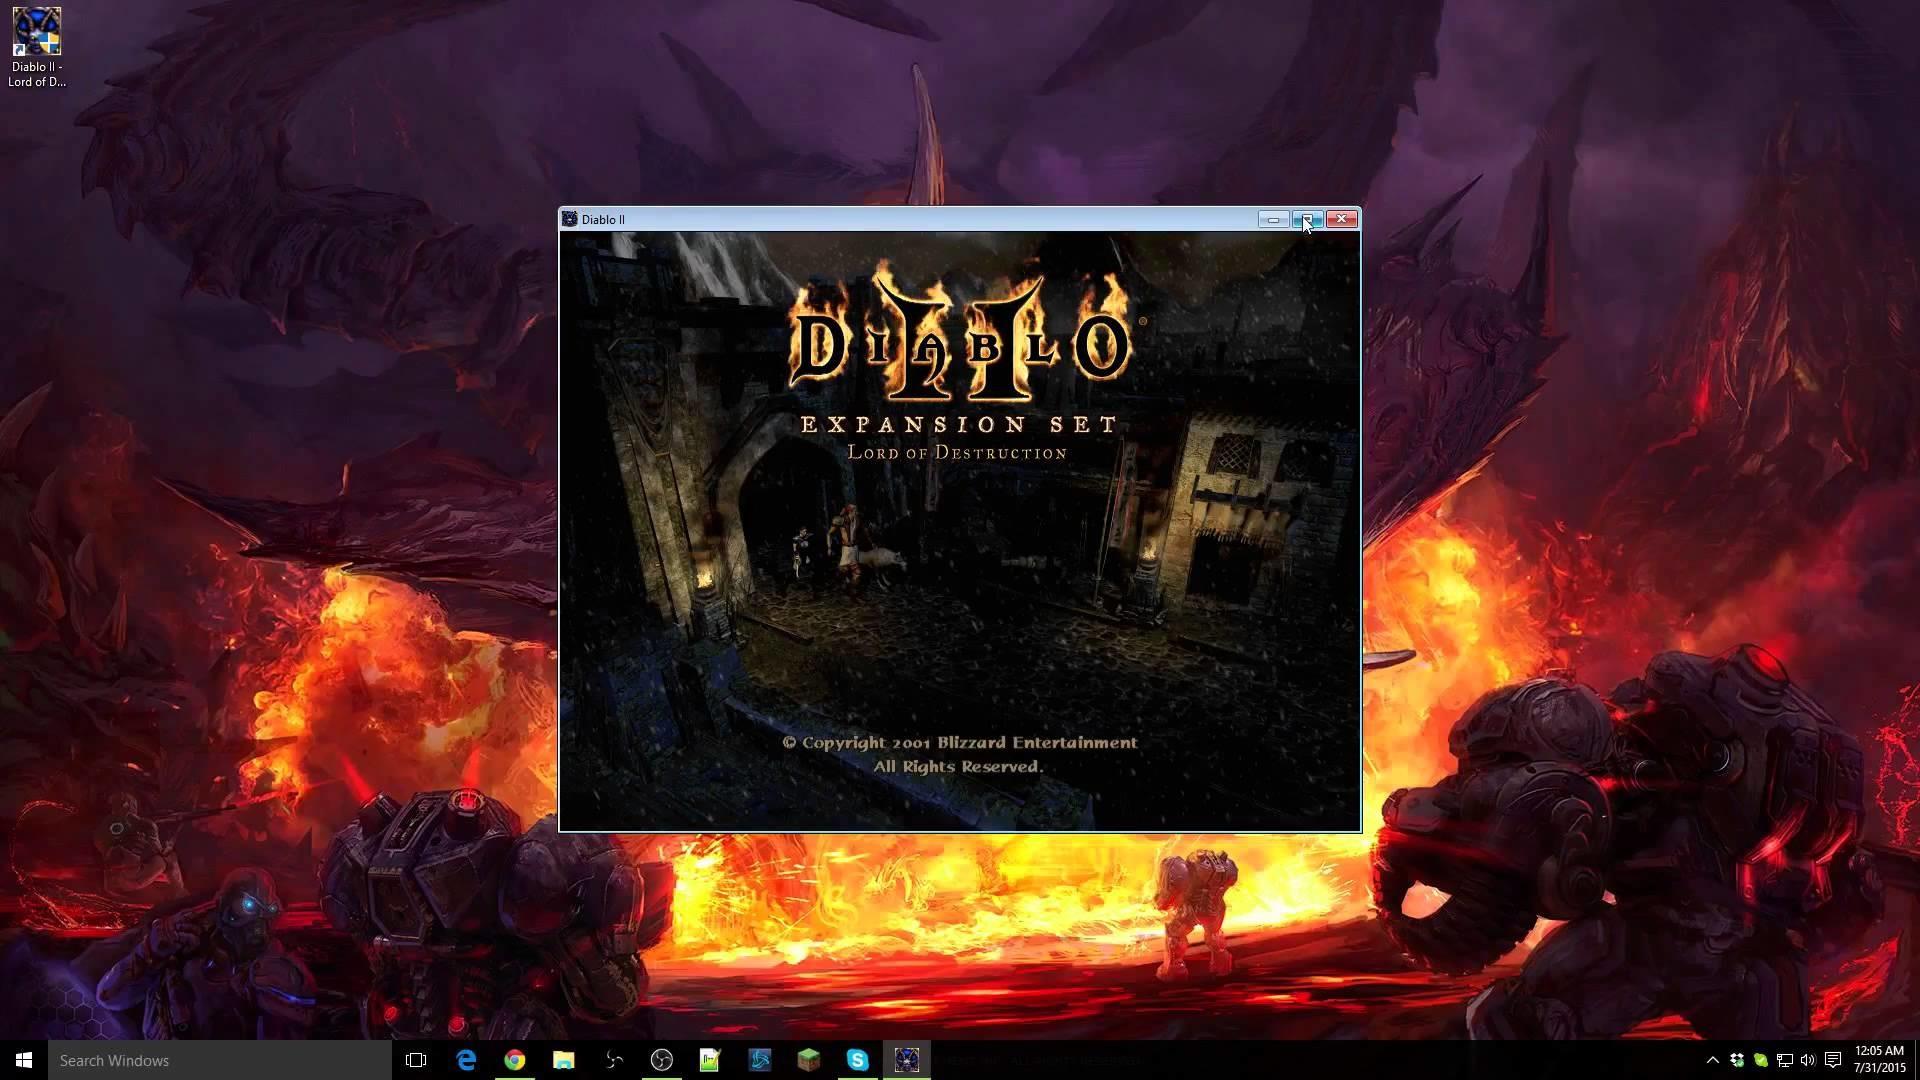 How to play Diablo II LoD on Windows 10 (Windowed Fullscreen) – YouTube